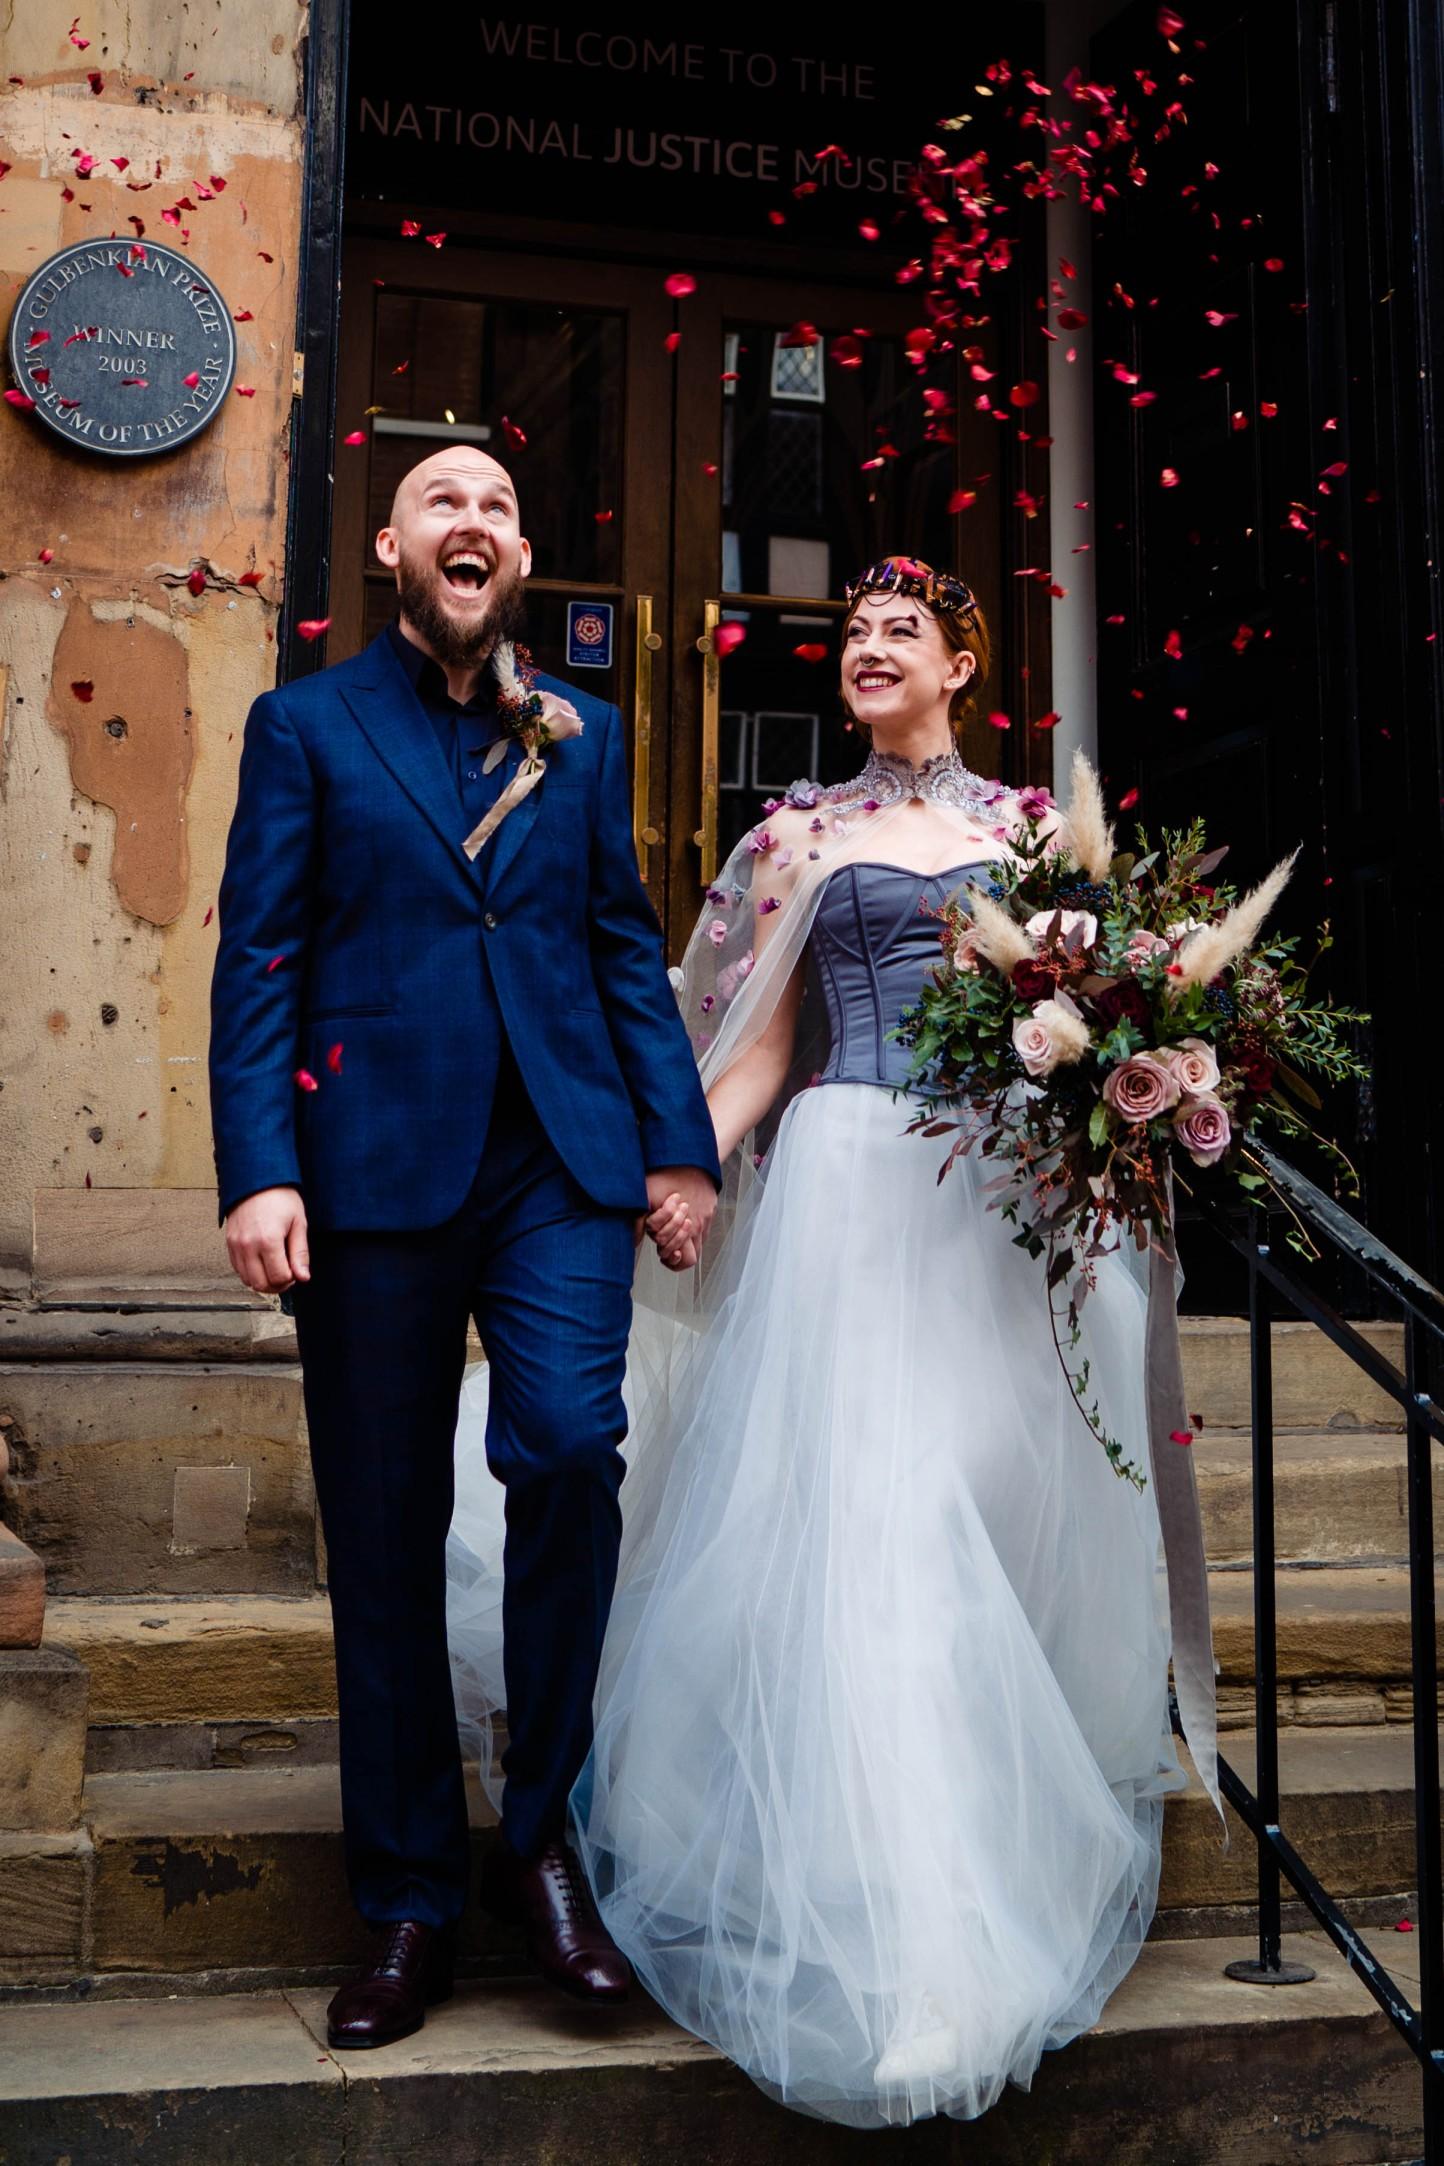 A gothic wedding - national justice museum wedding - alternative wedding - Vicki Clayson Photography (30)